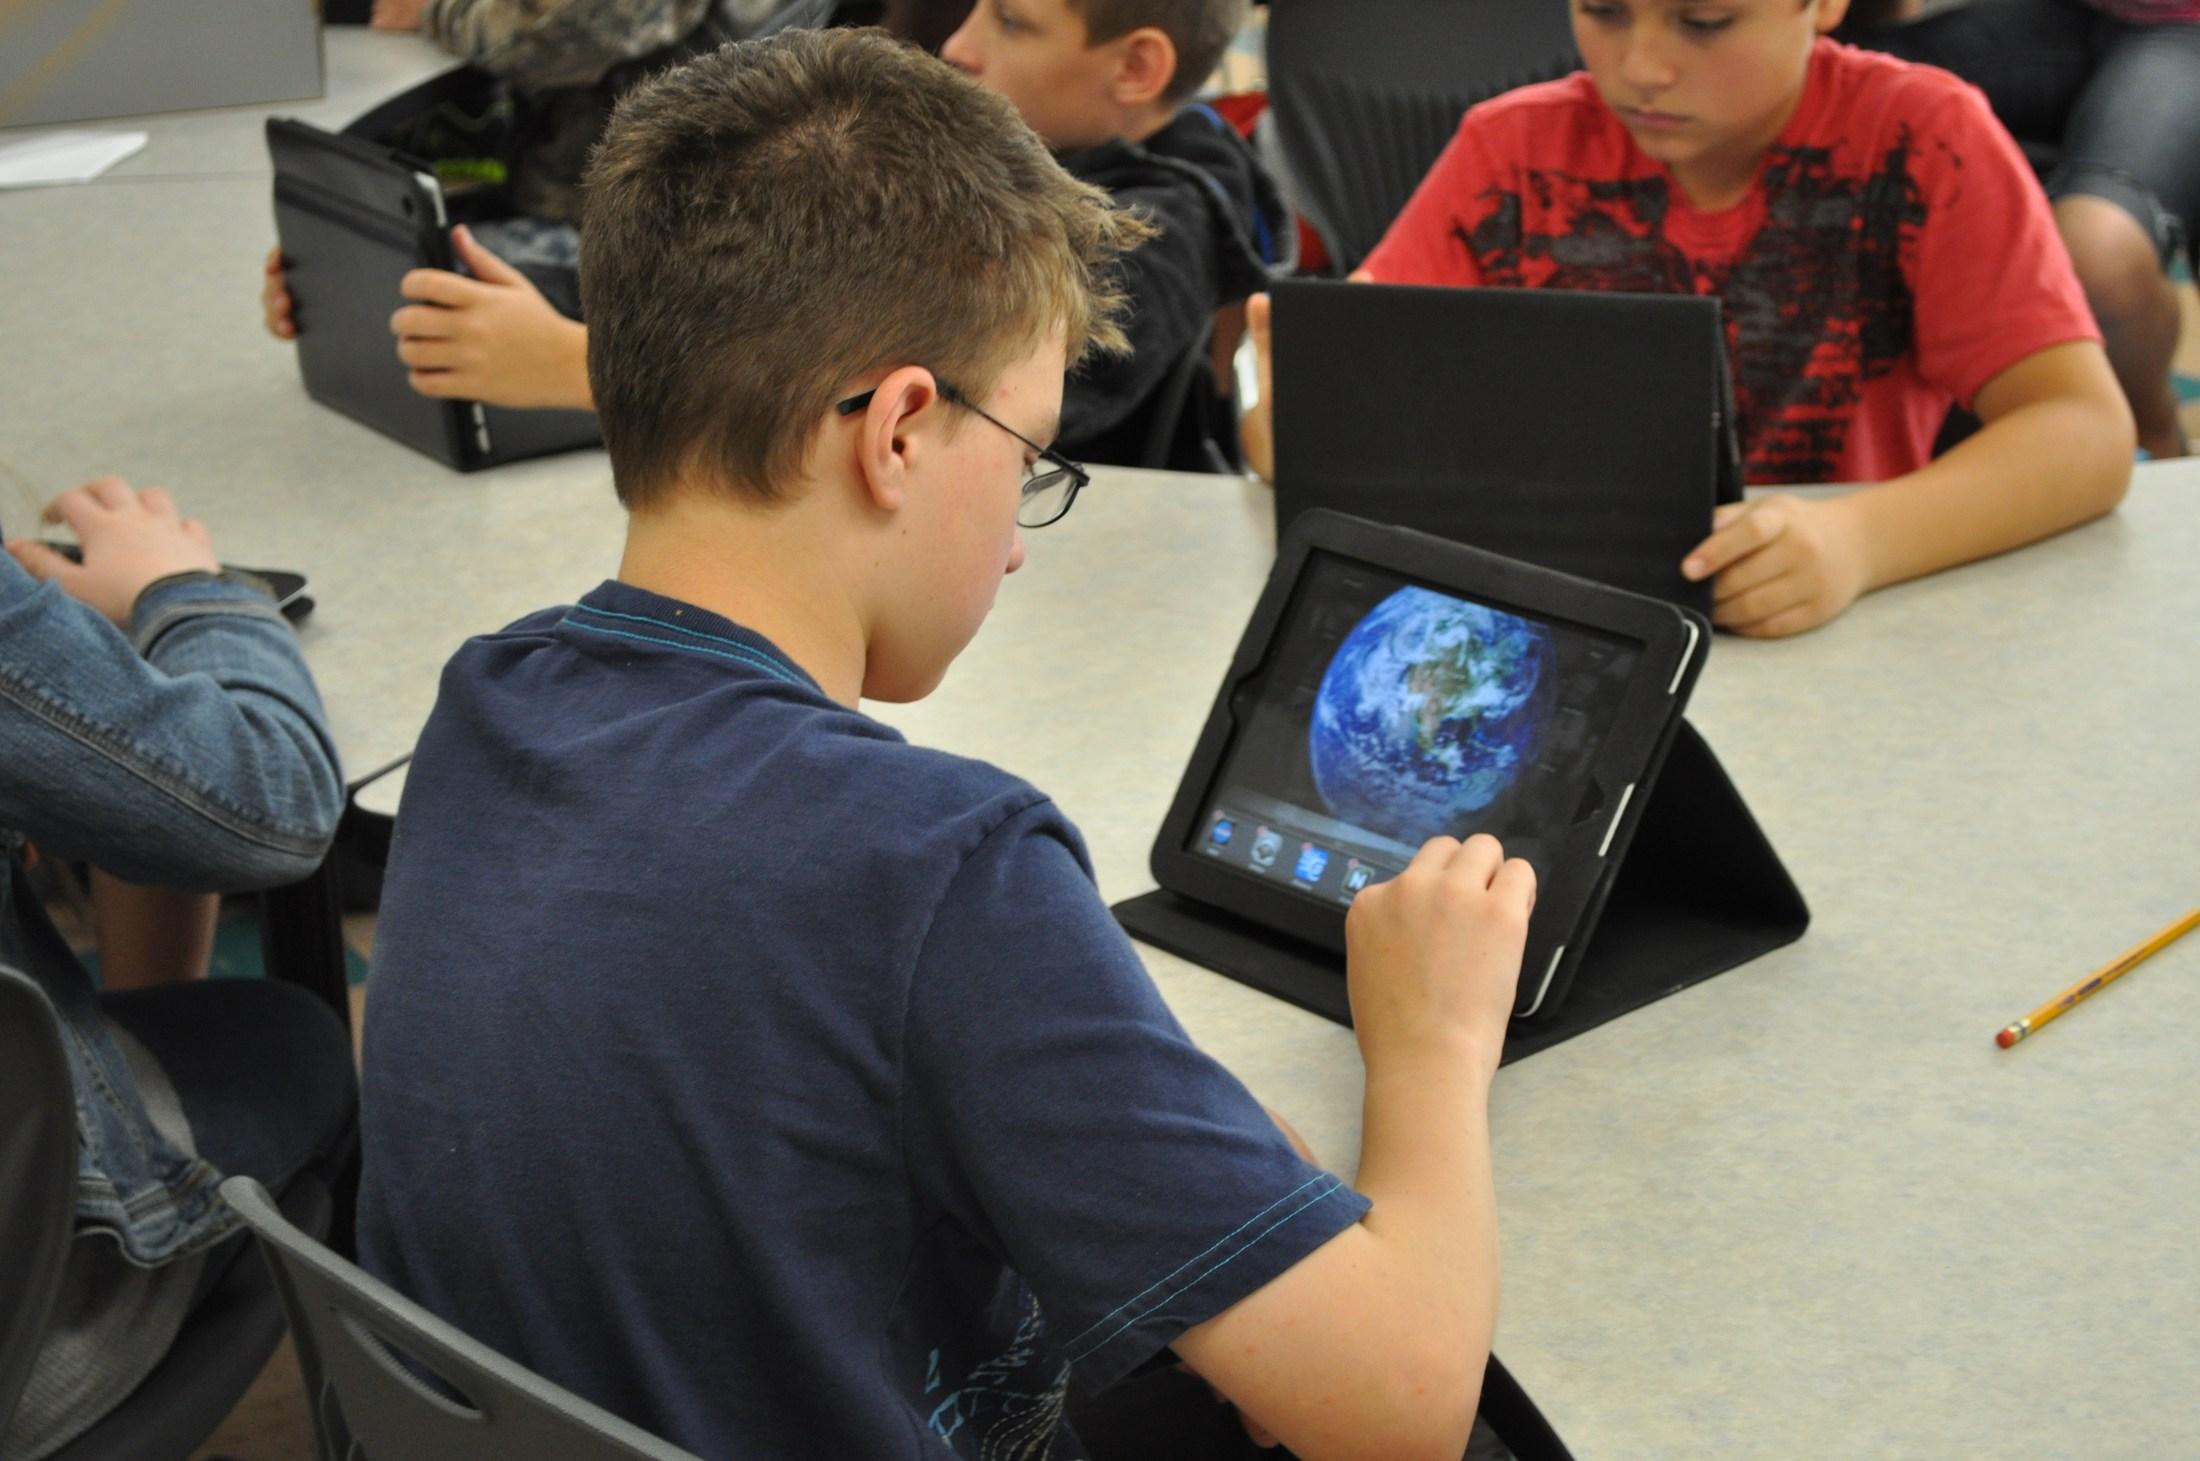 Student working on iPad